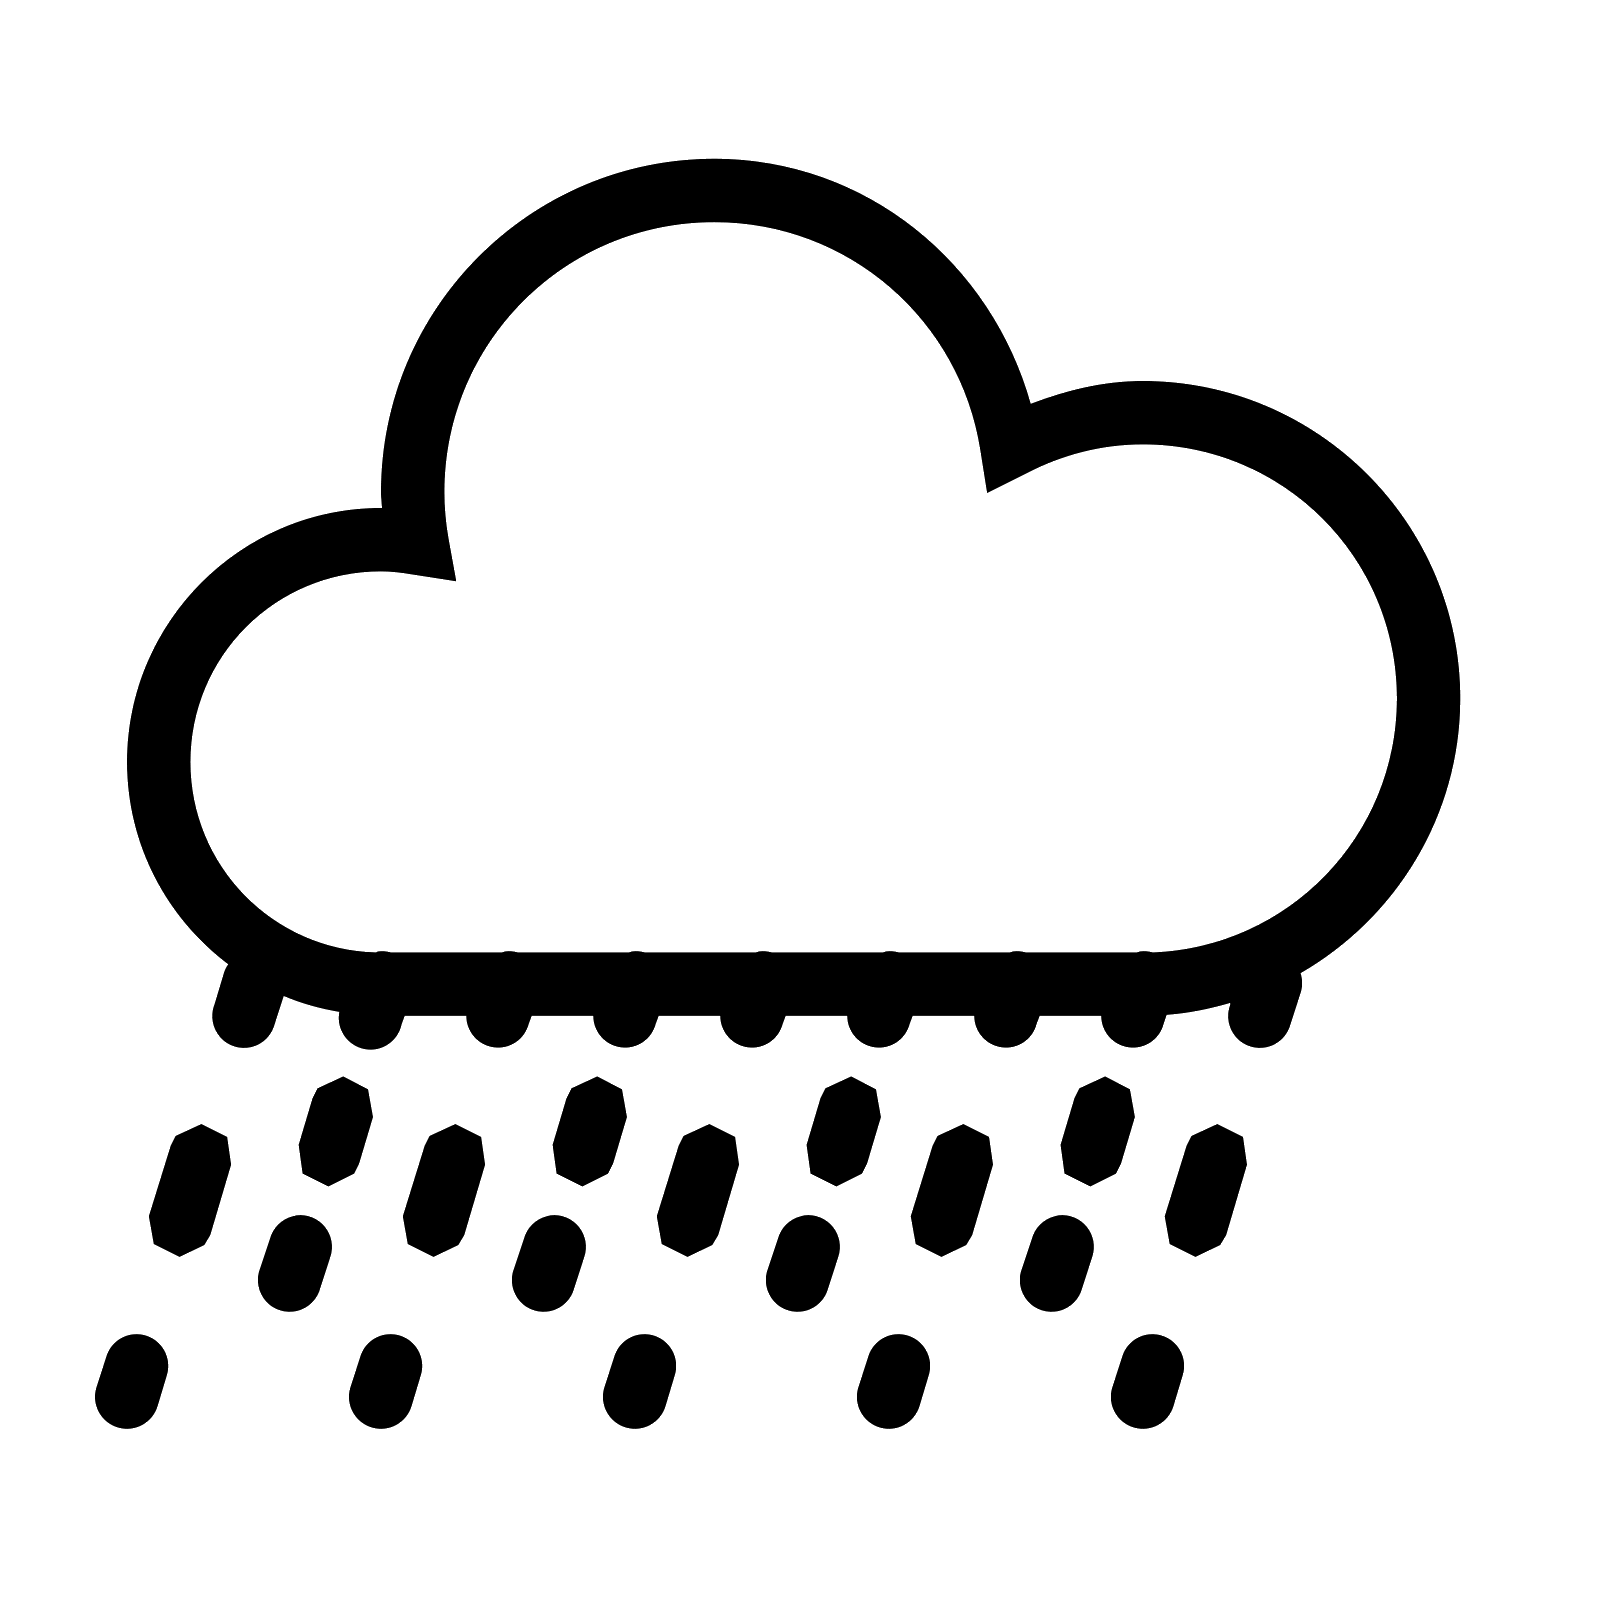 Raindrop Clipart Moisture Raindrop Moisture Transparent